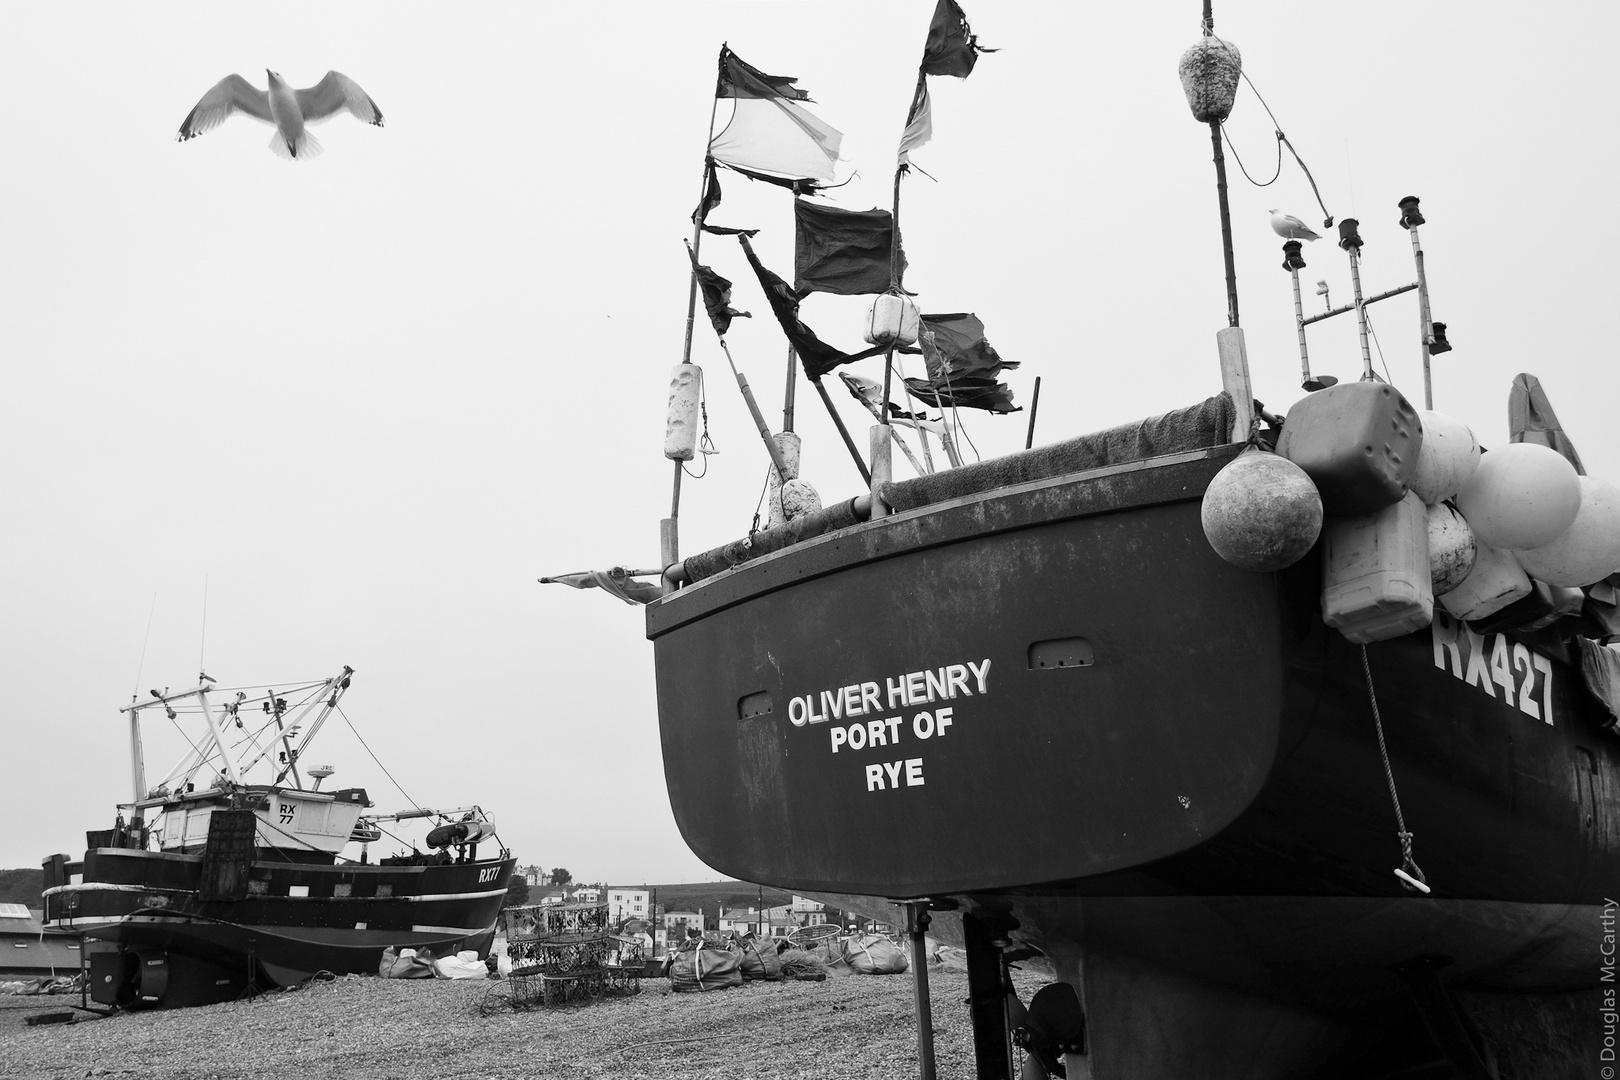 Oliver Henry, Port of Rye